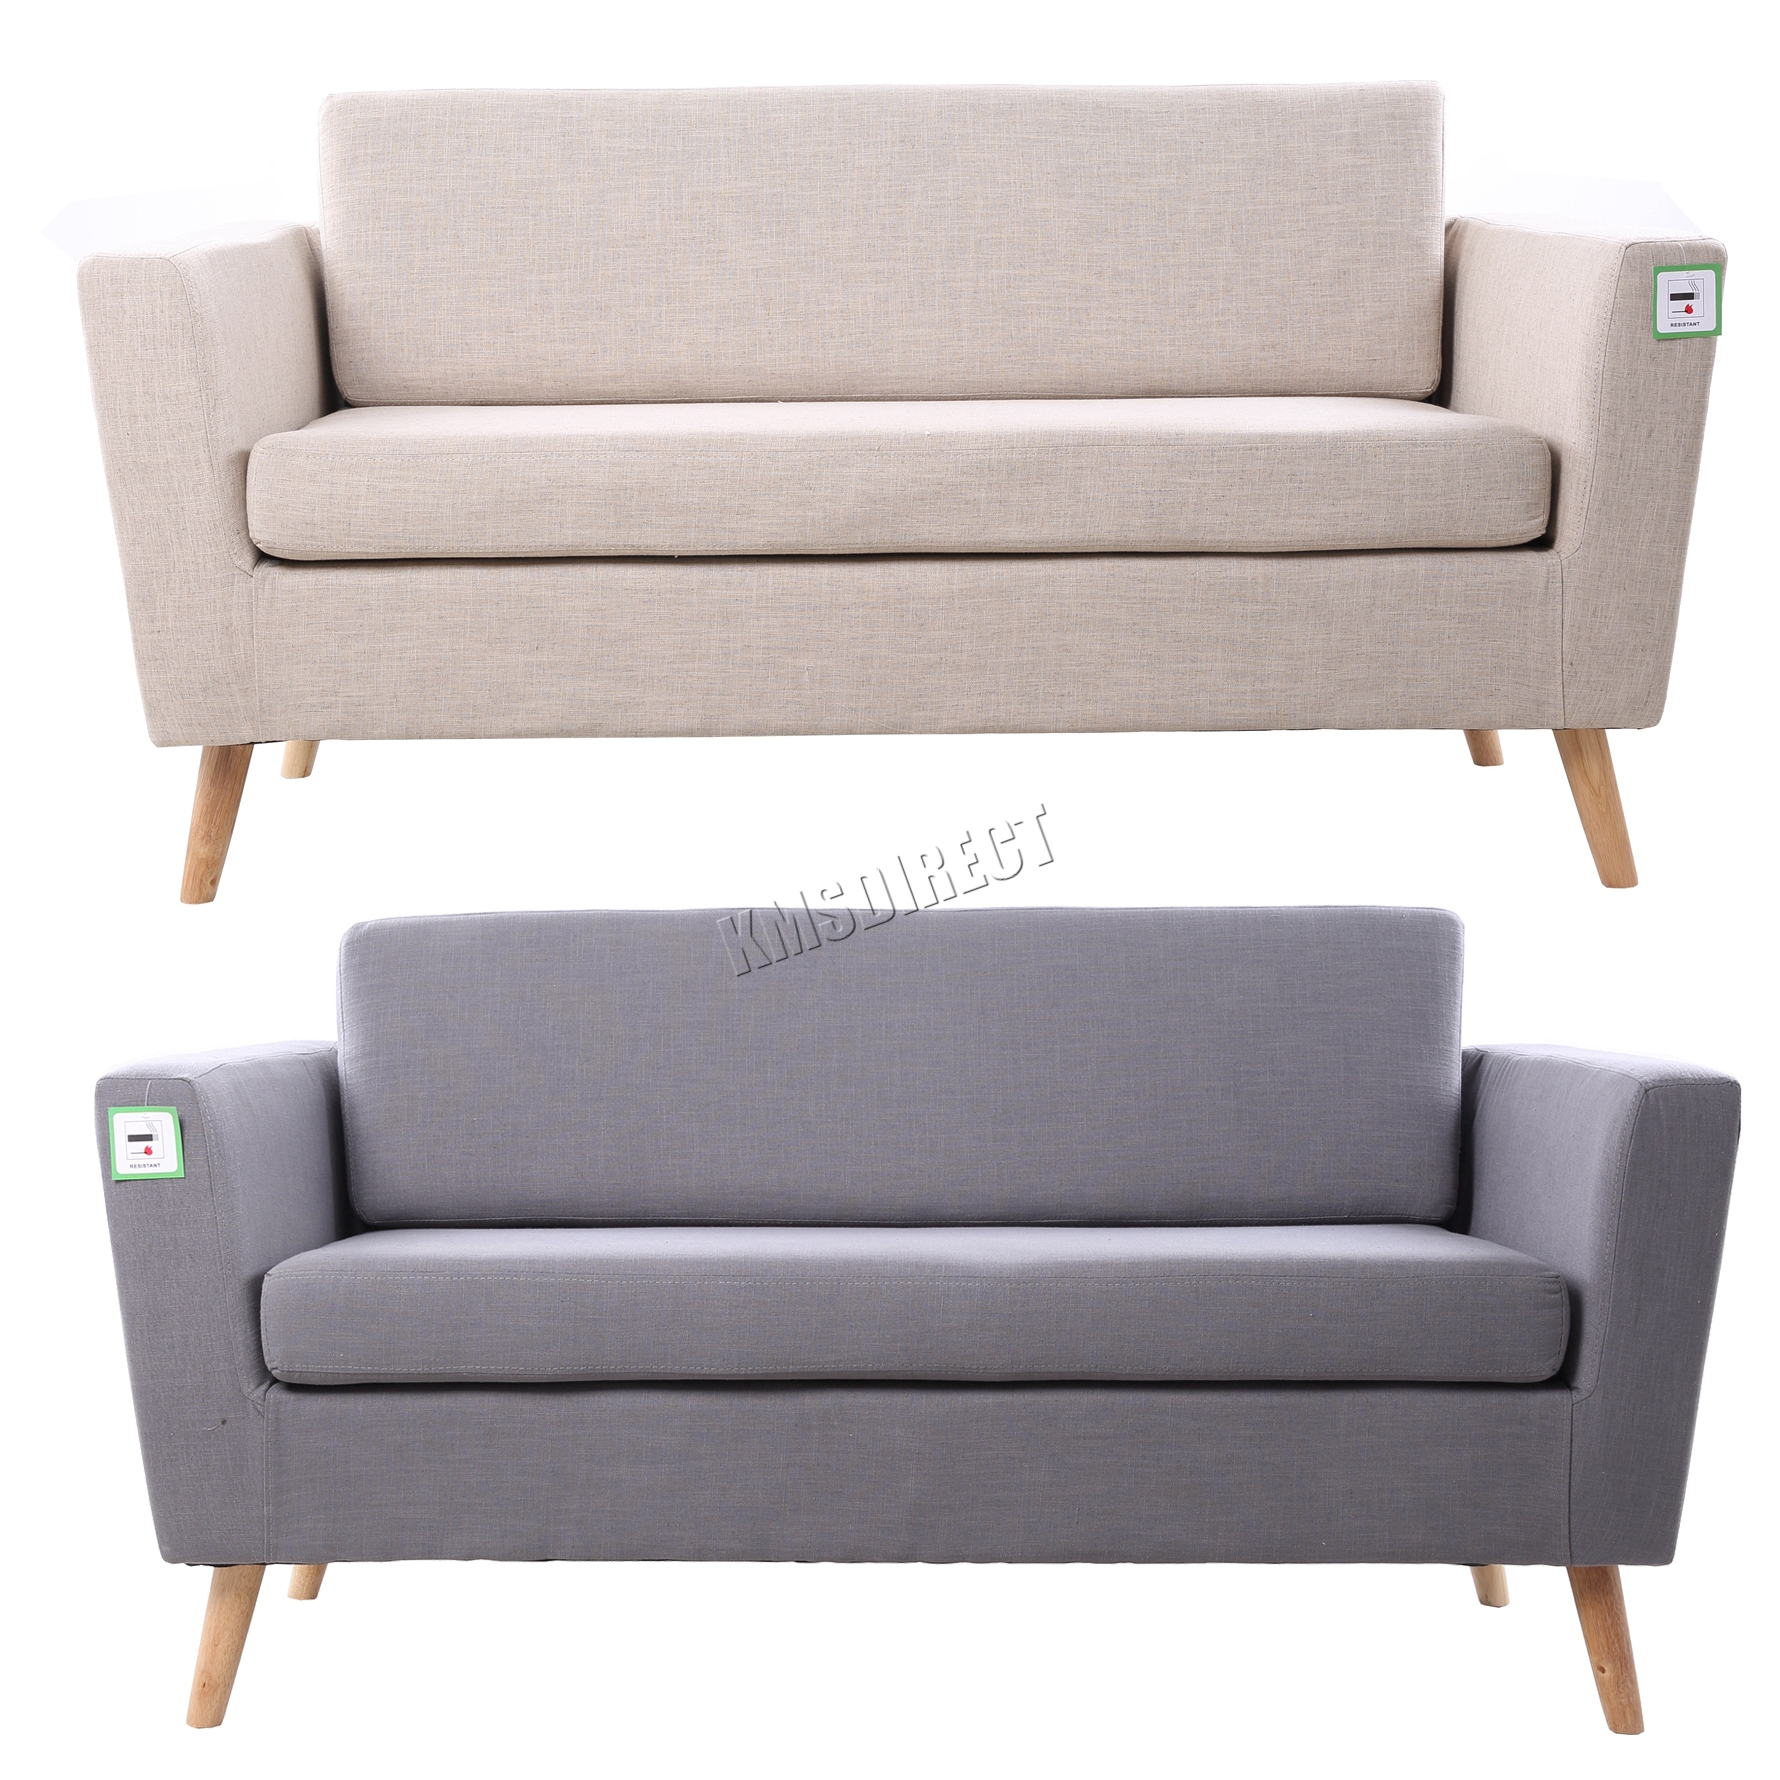 foxhunter linen fabric 2 seat sofa settee dining room